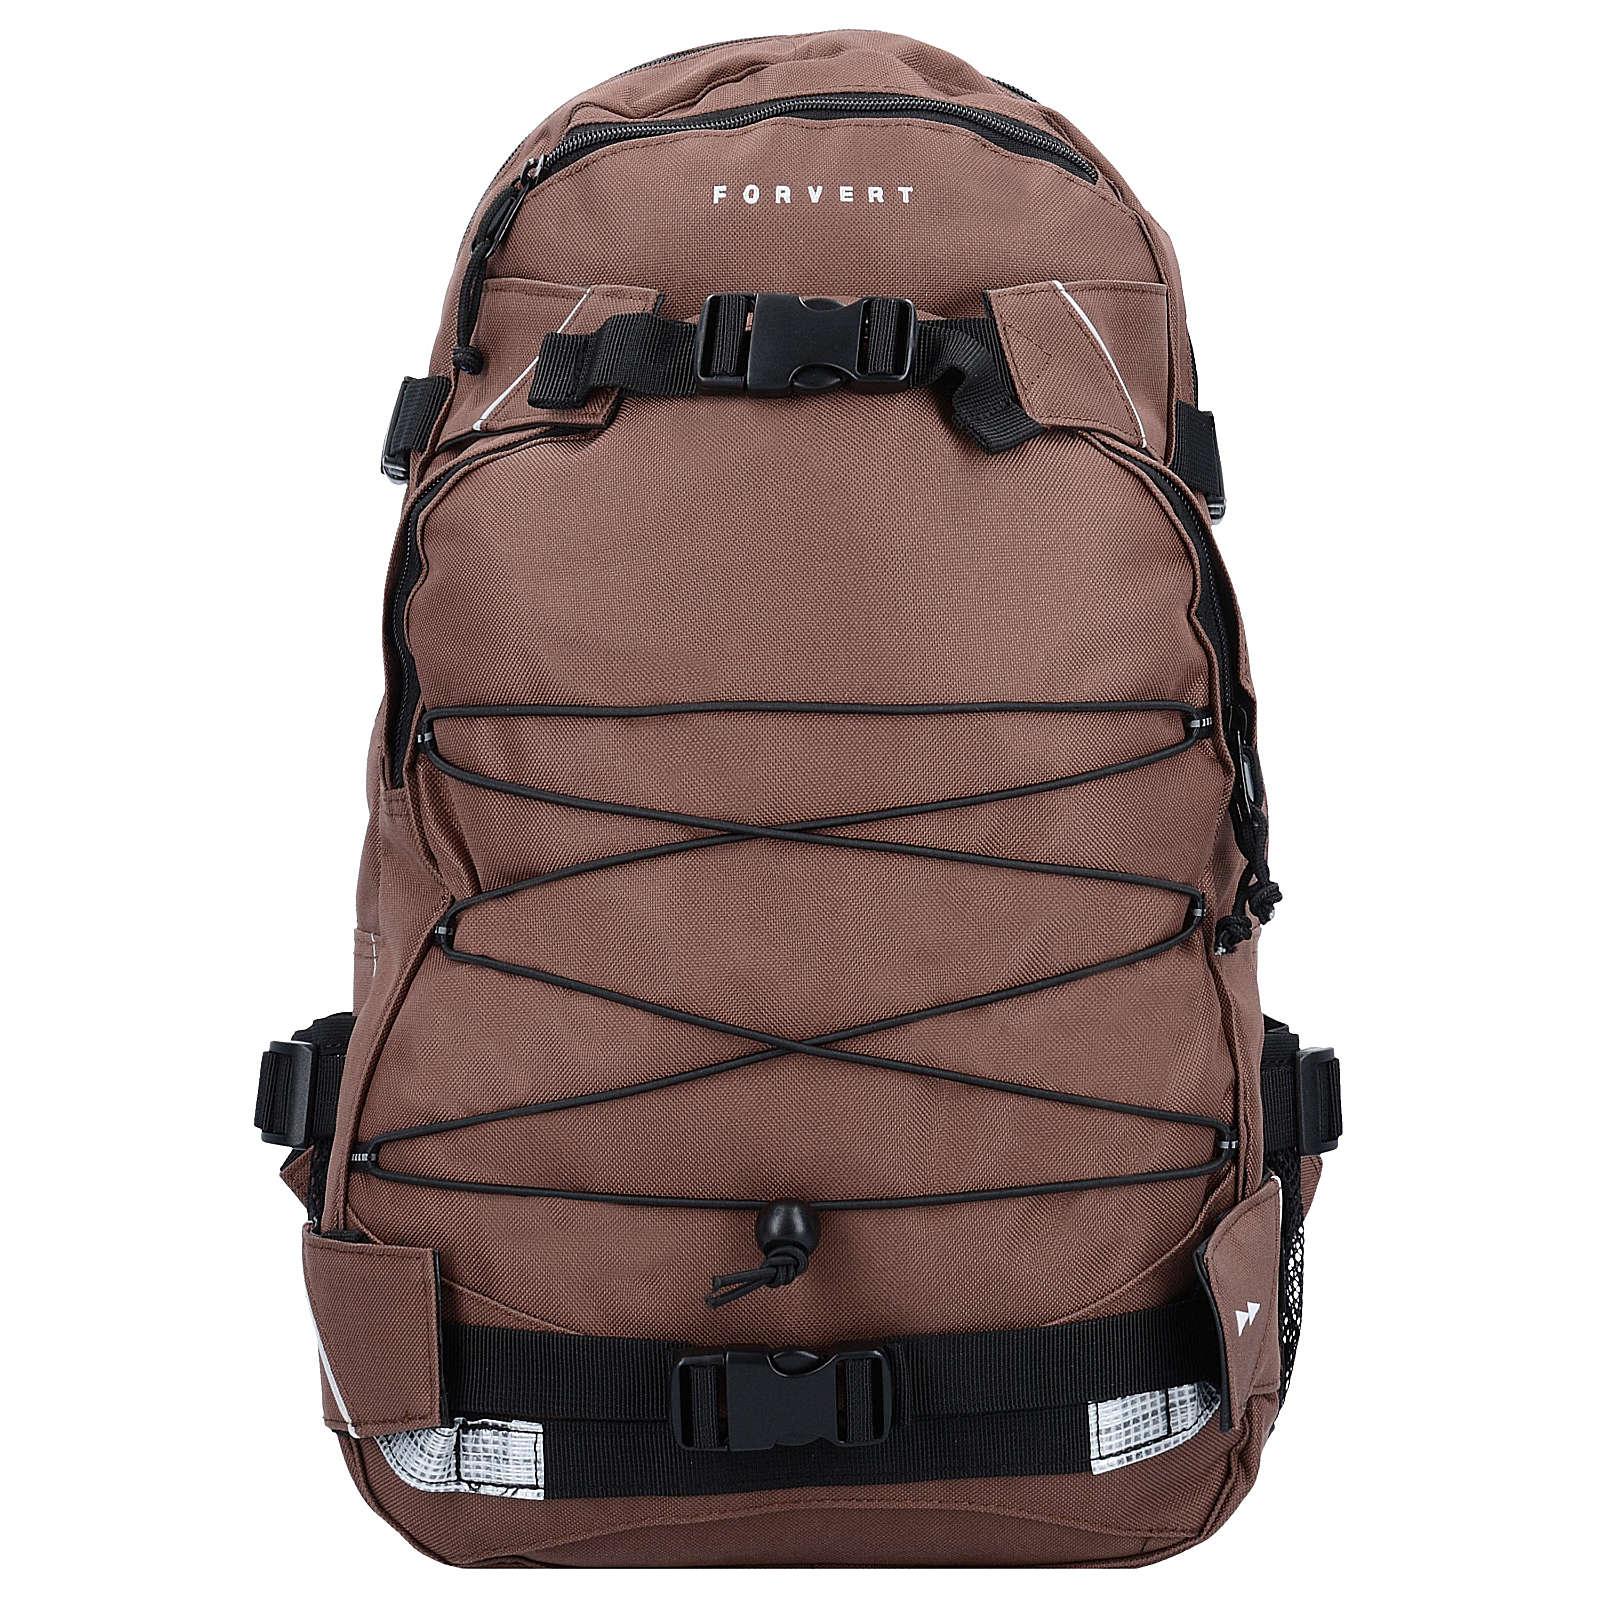 Forvert Backpack Laptop Louis Rucksäcke braun